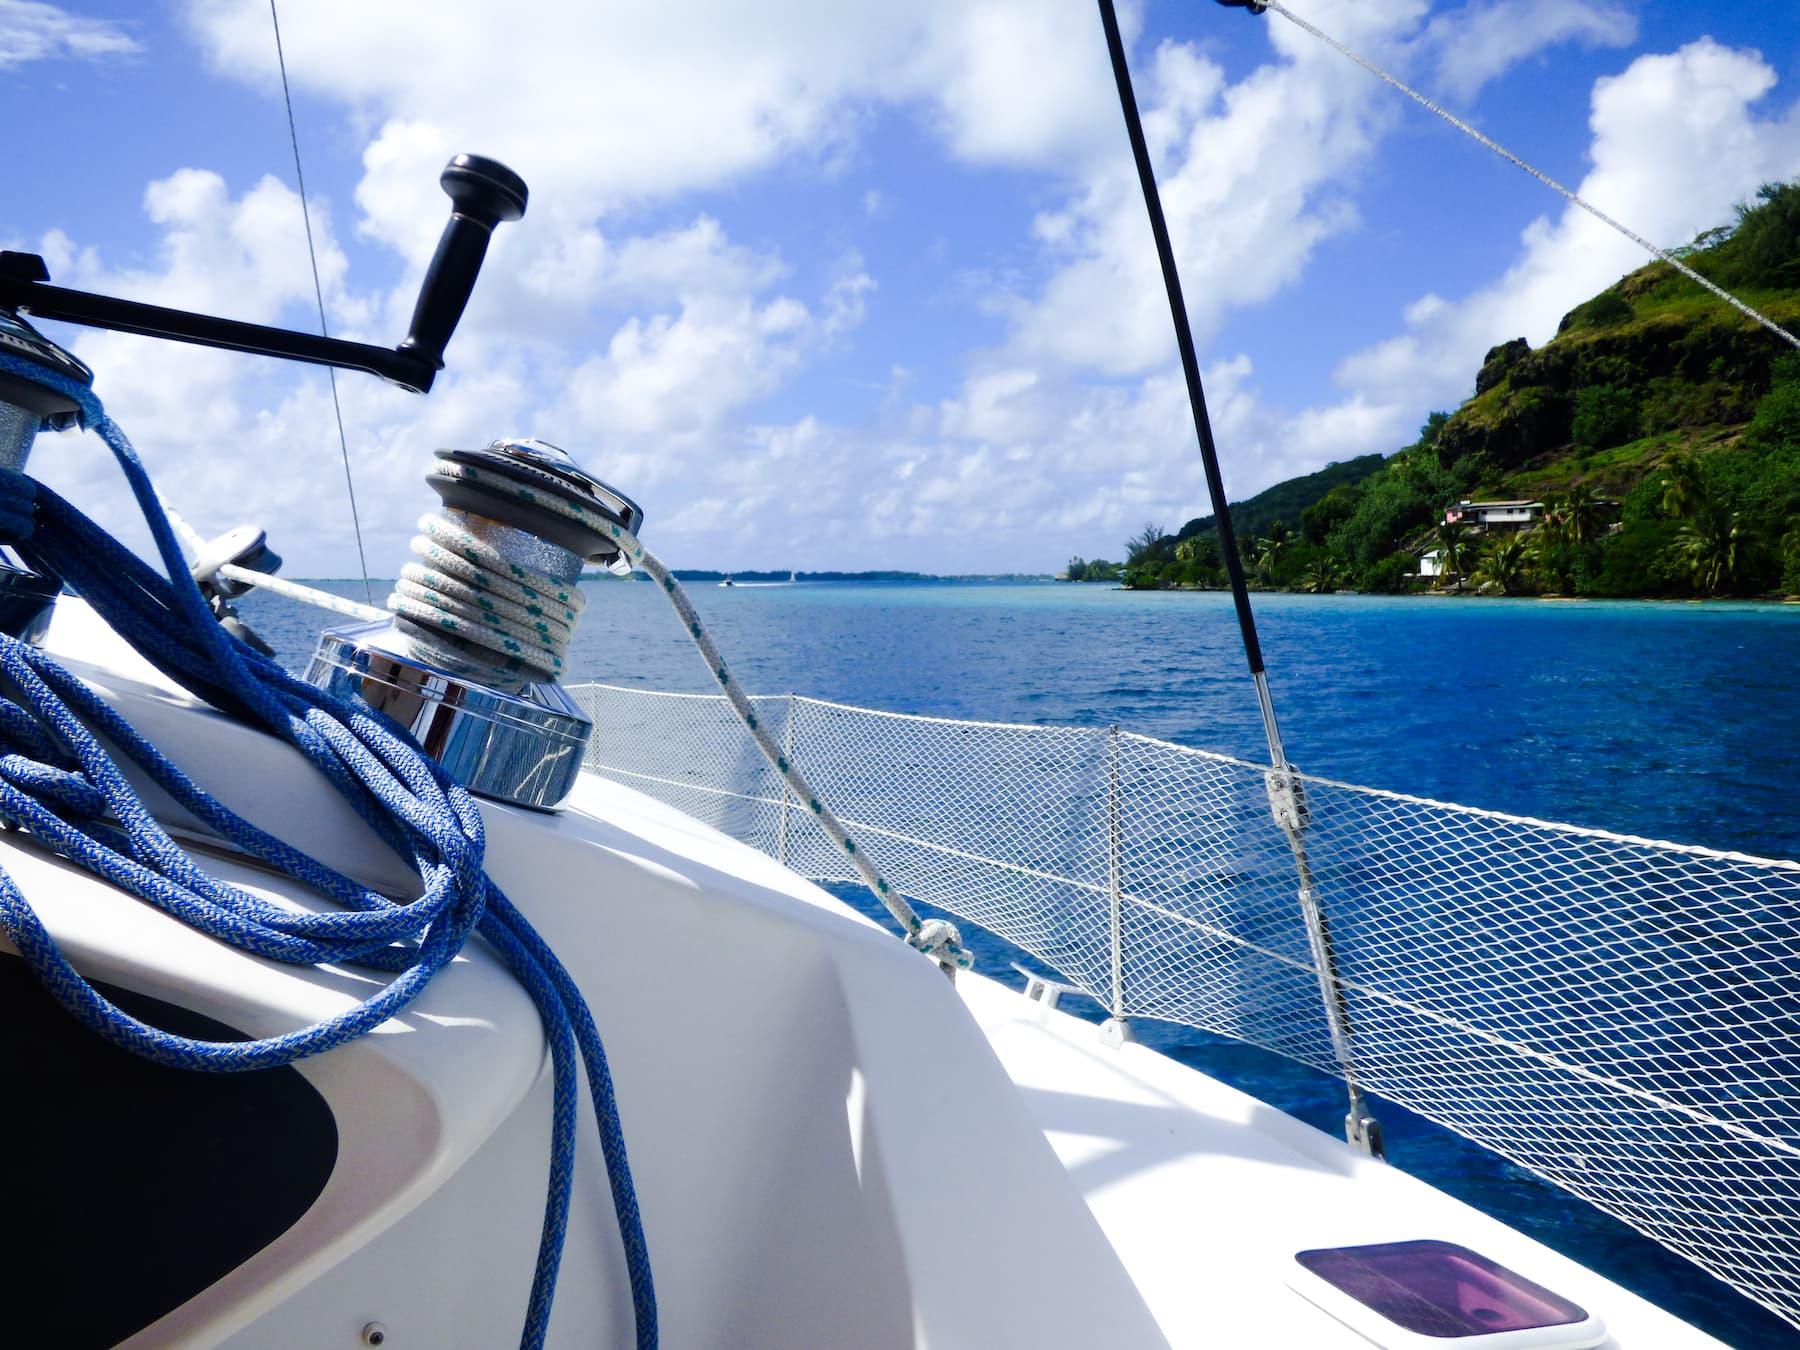 https://tahititourisme.mx/wp-content/uploads/2017/08/bateau-tlc-modif-13.jpg